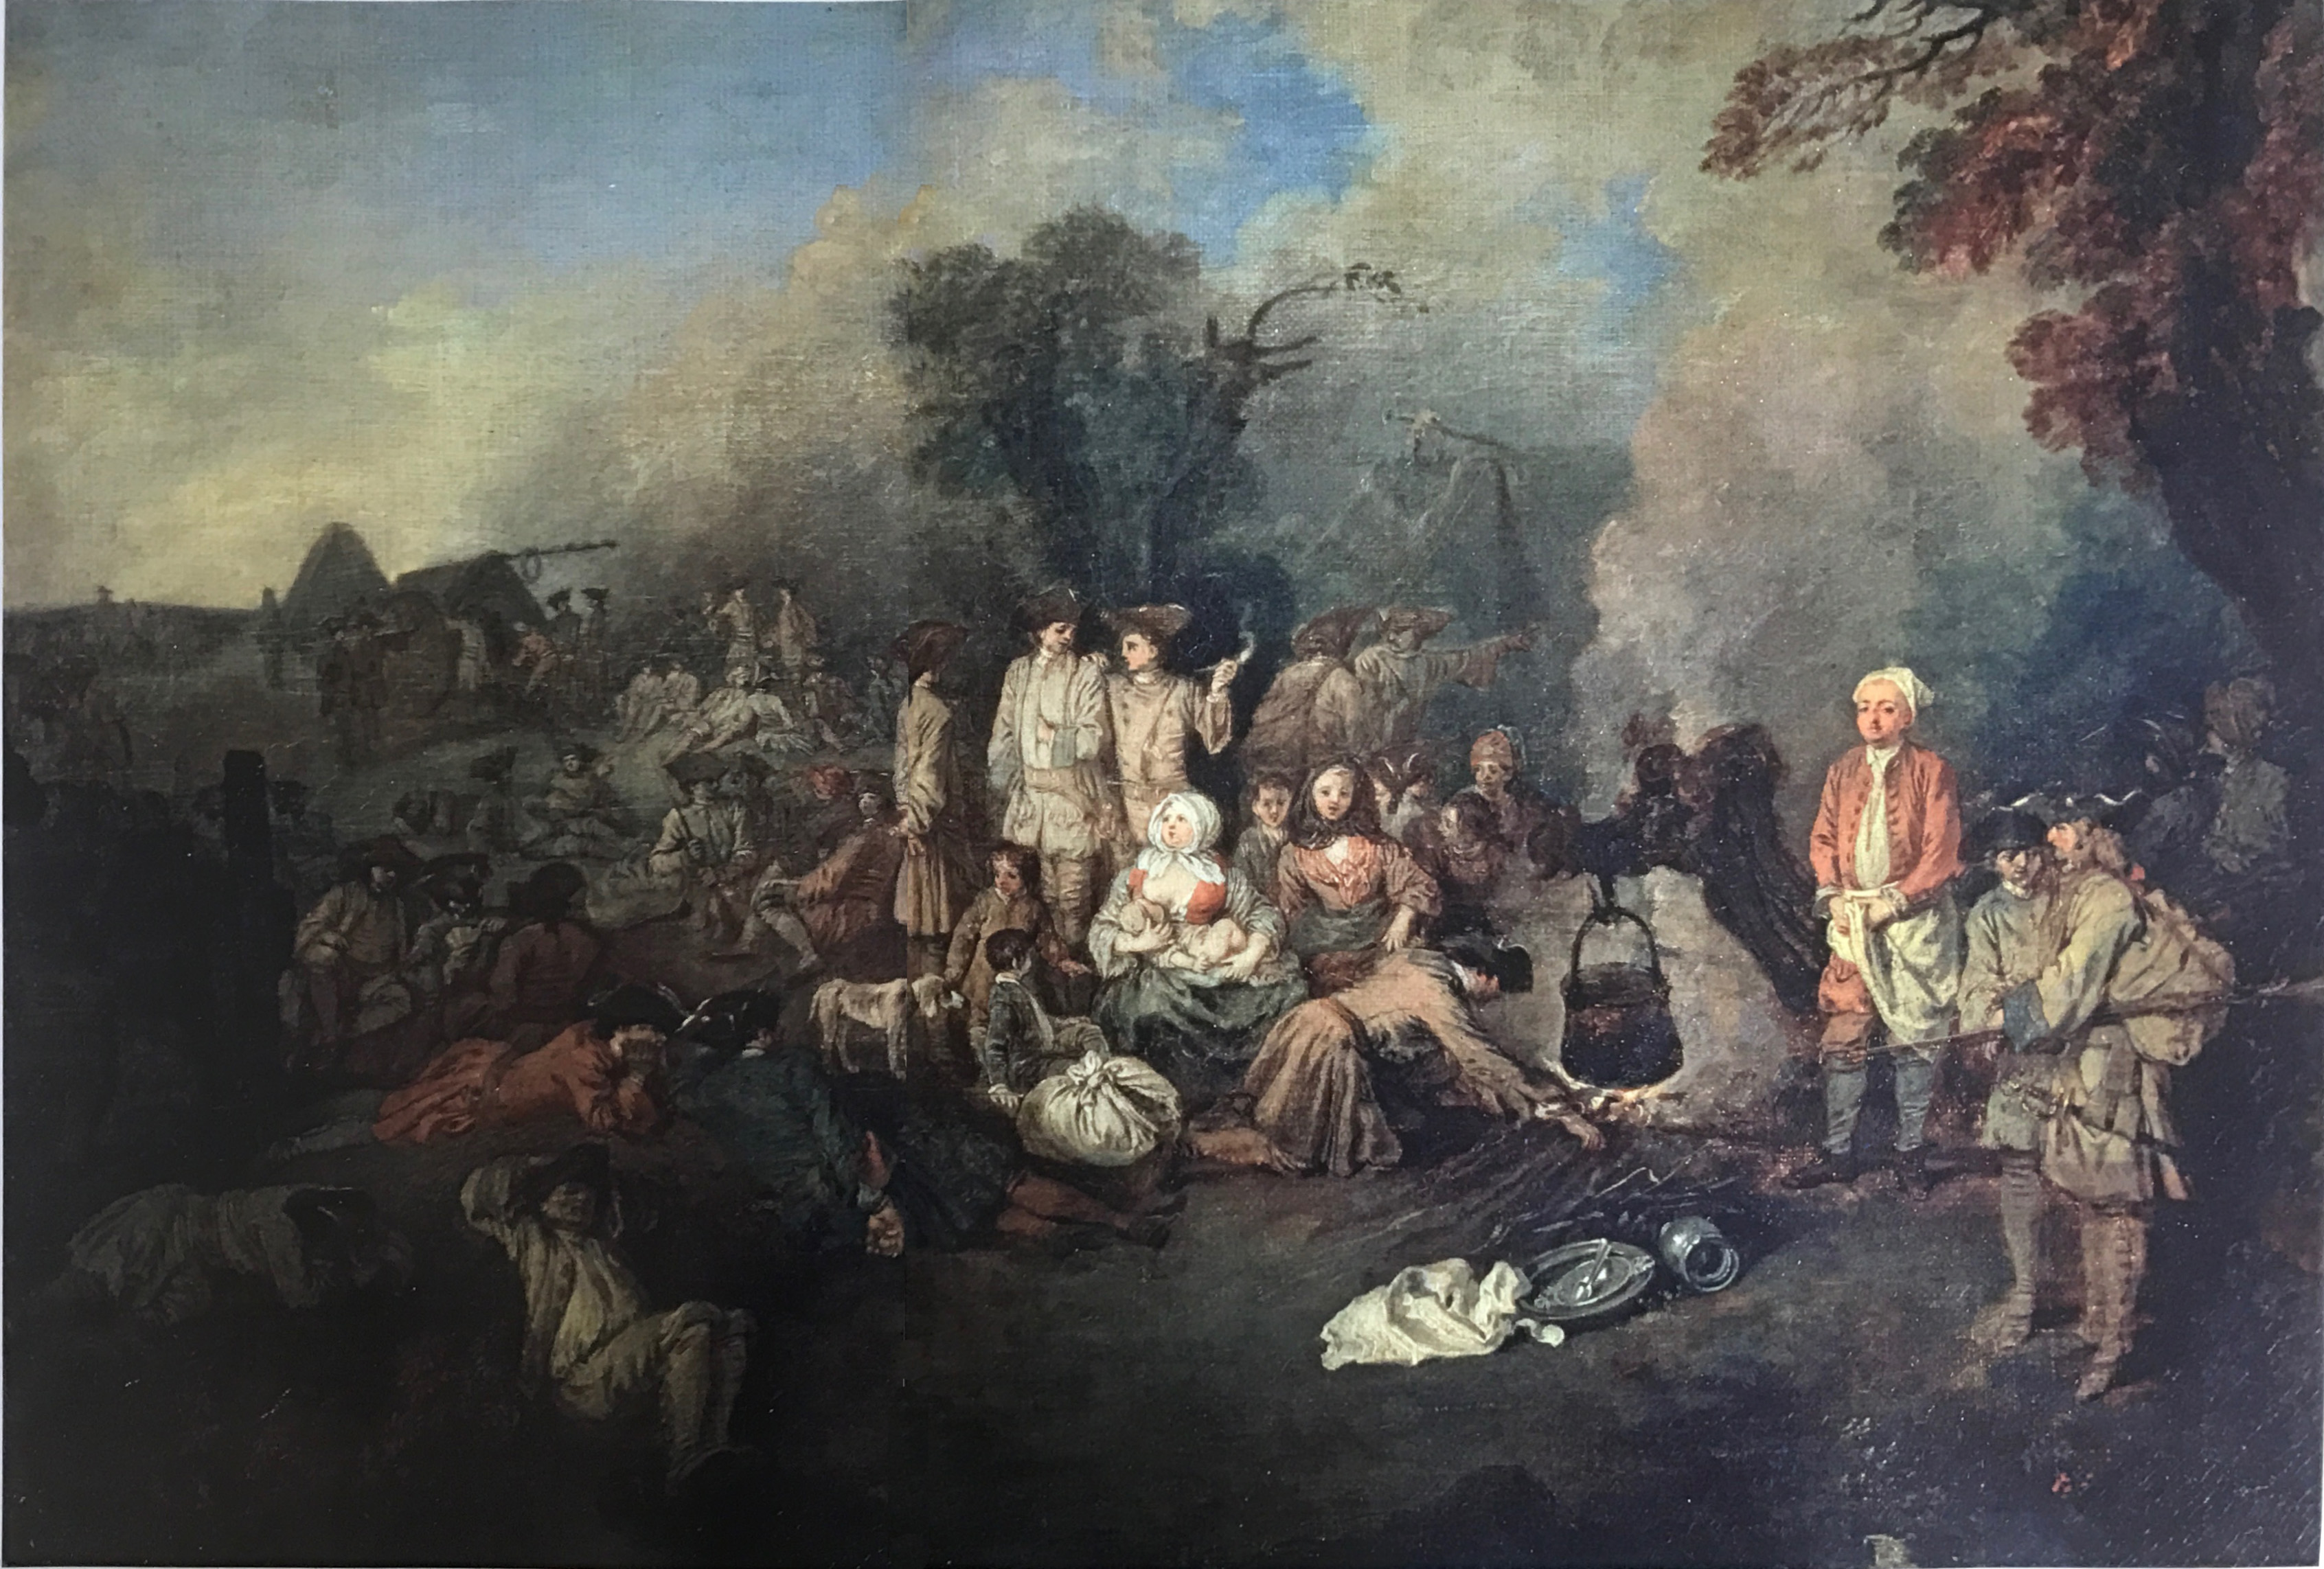 watteau-1710 ca le-camp-volant Musee Pouchkine Moscou